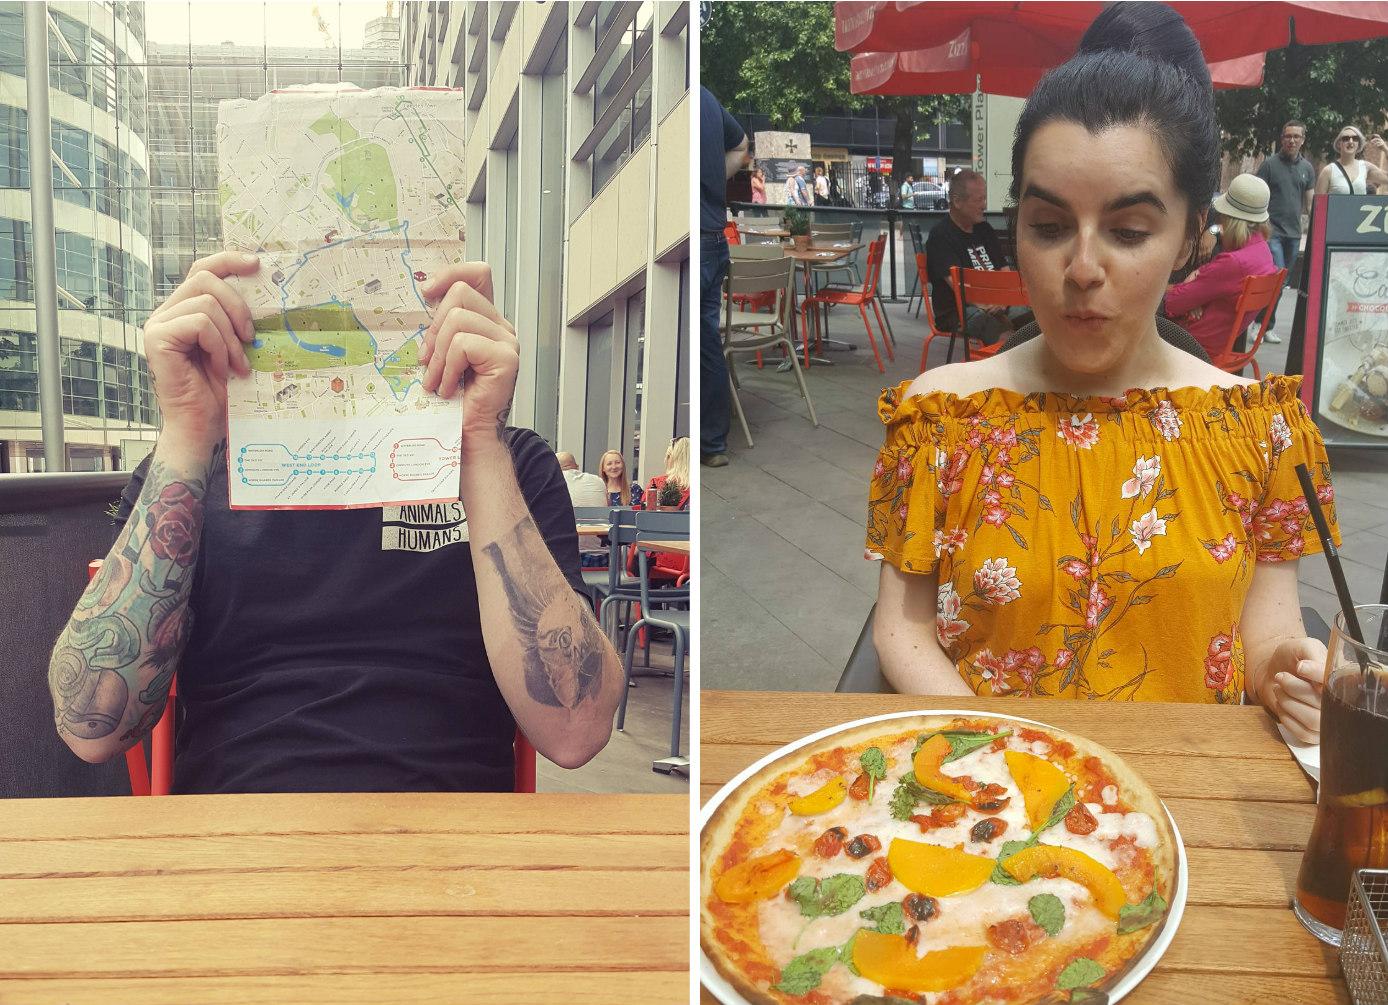 london-photo-diary-vegan-zizzis-pizza